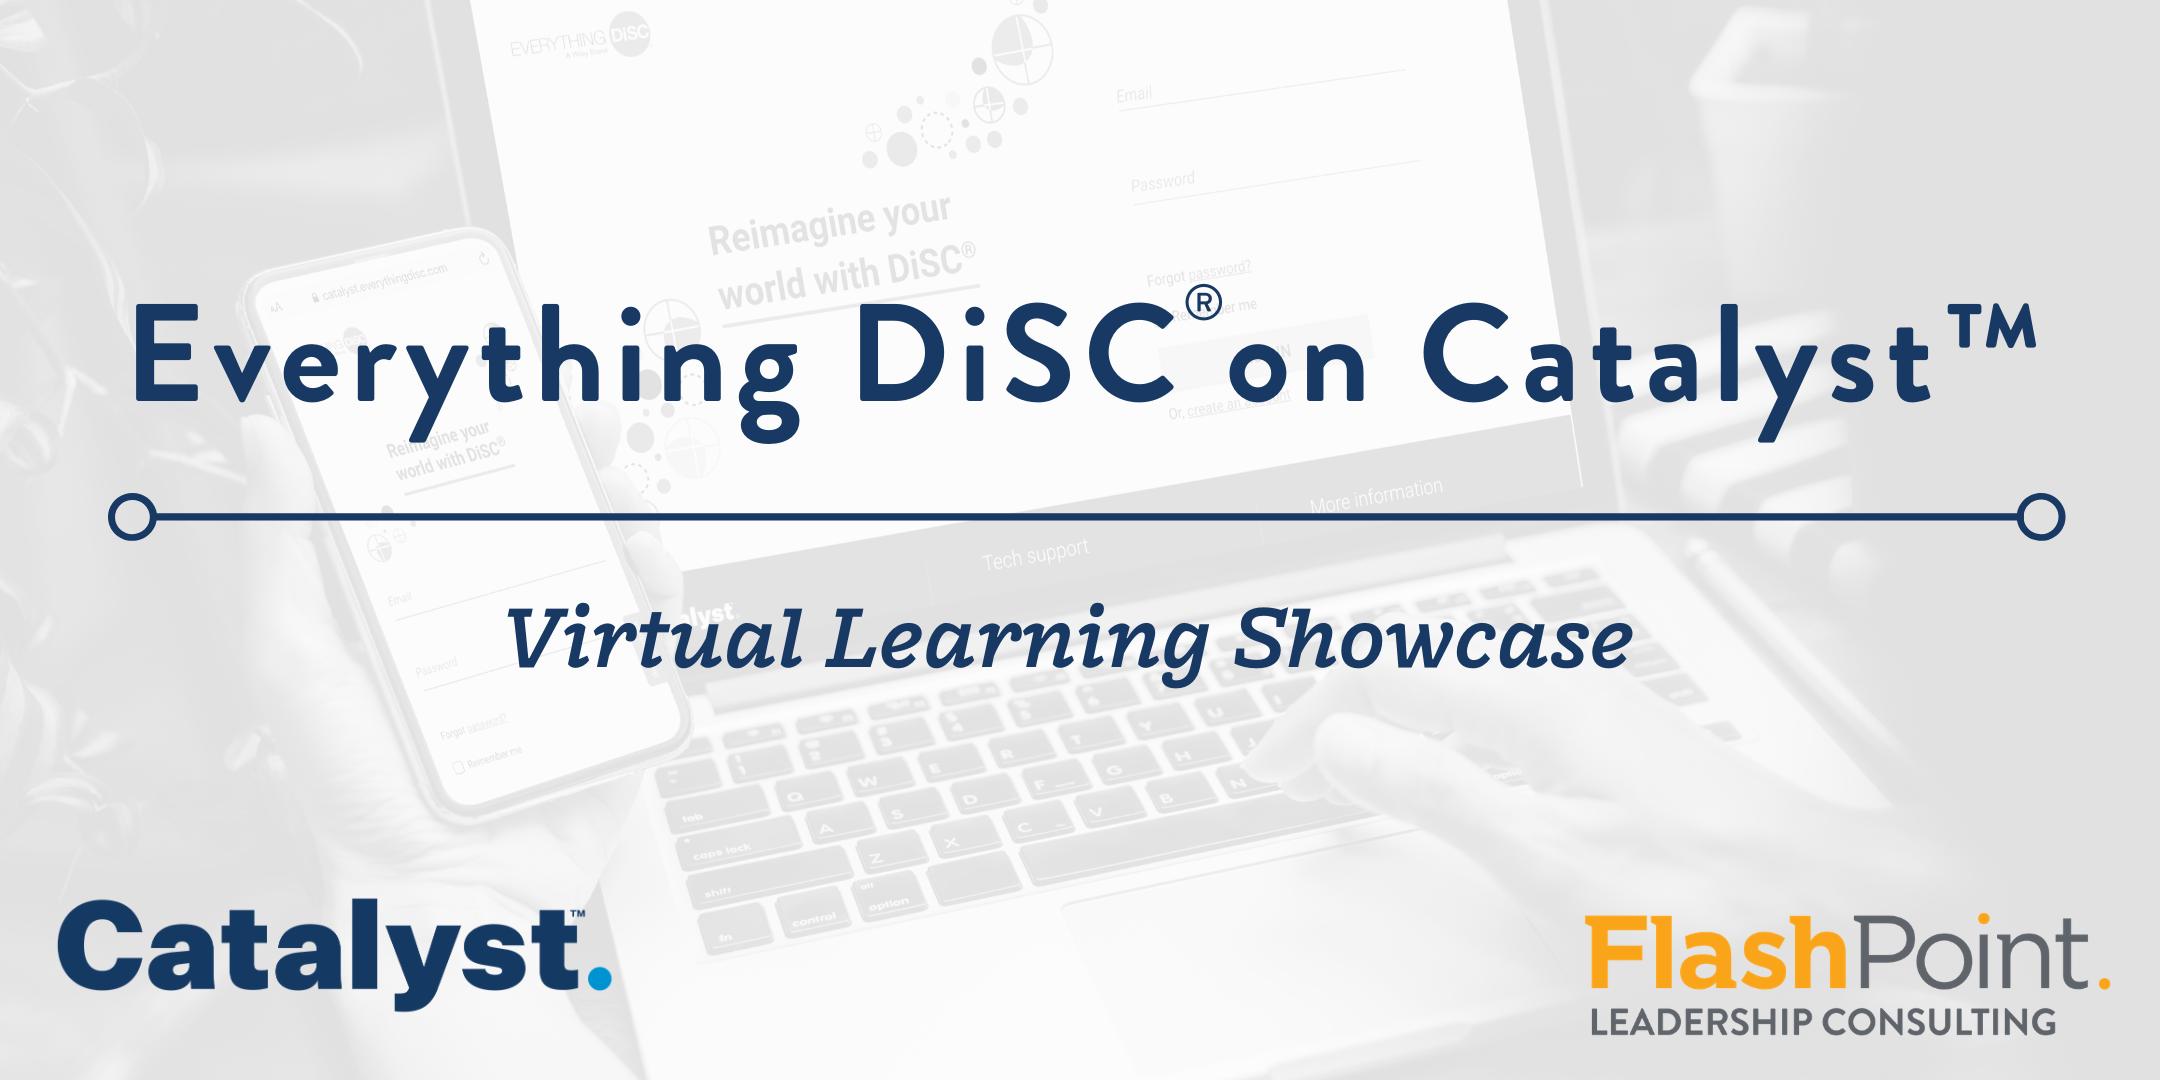 DiSC Showcase Header Catalyst